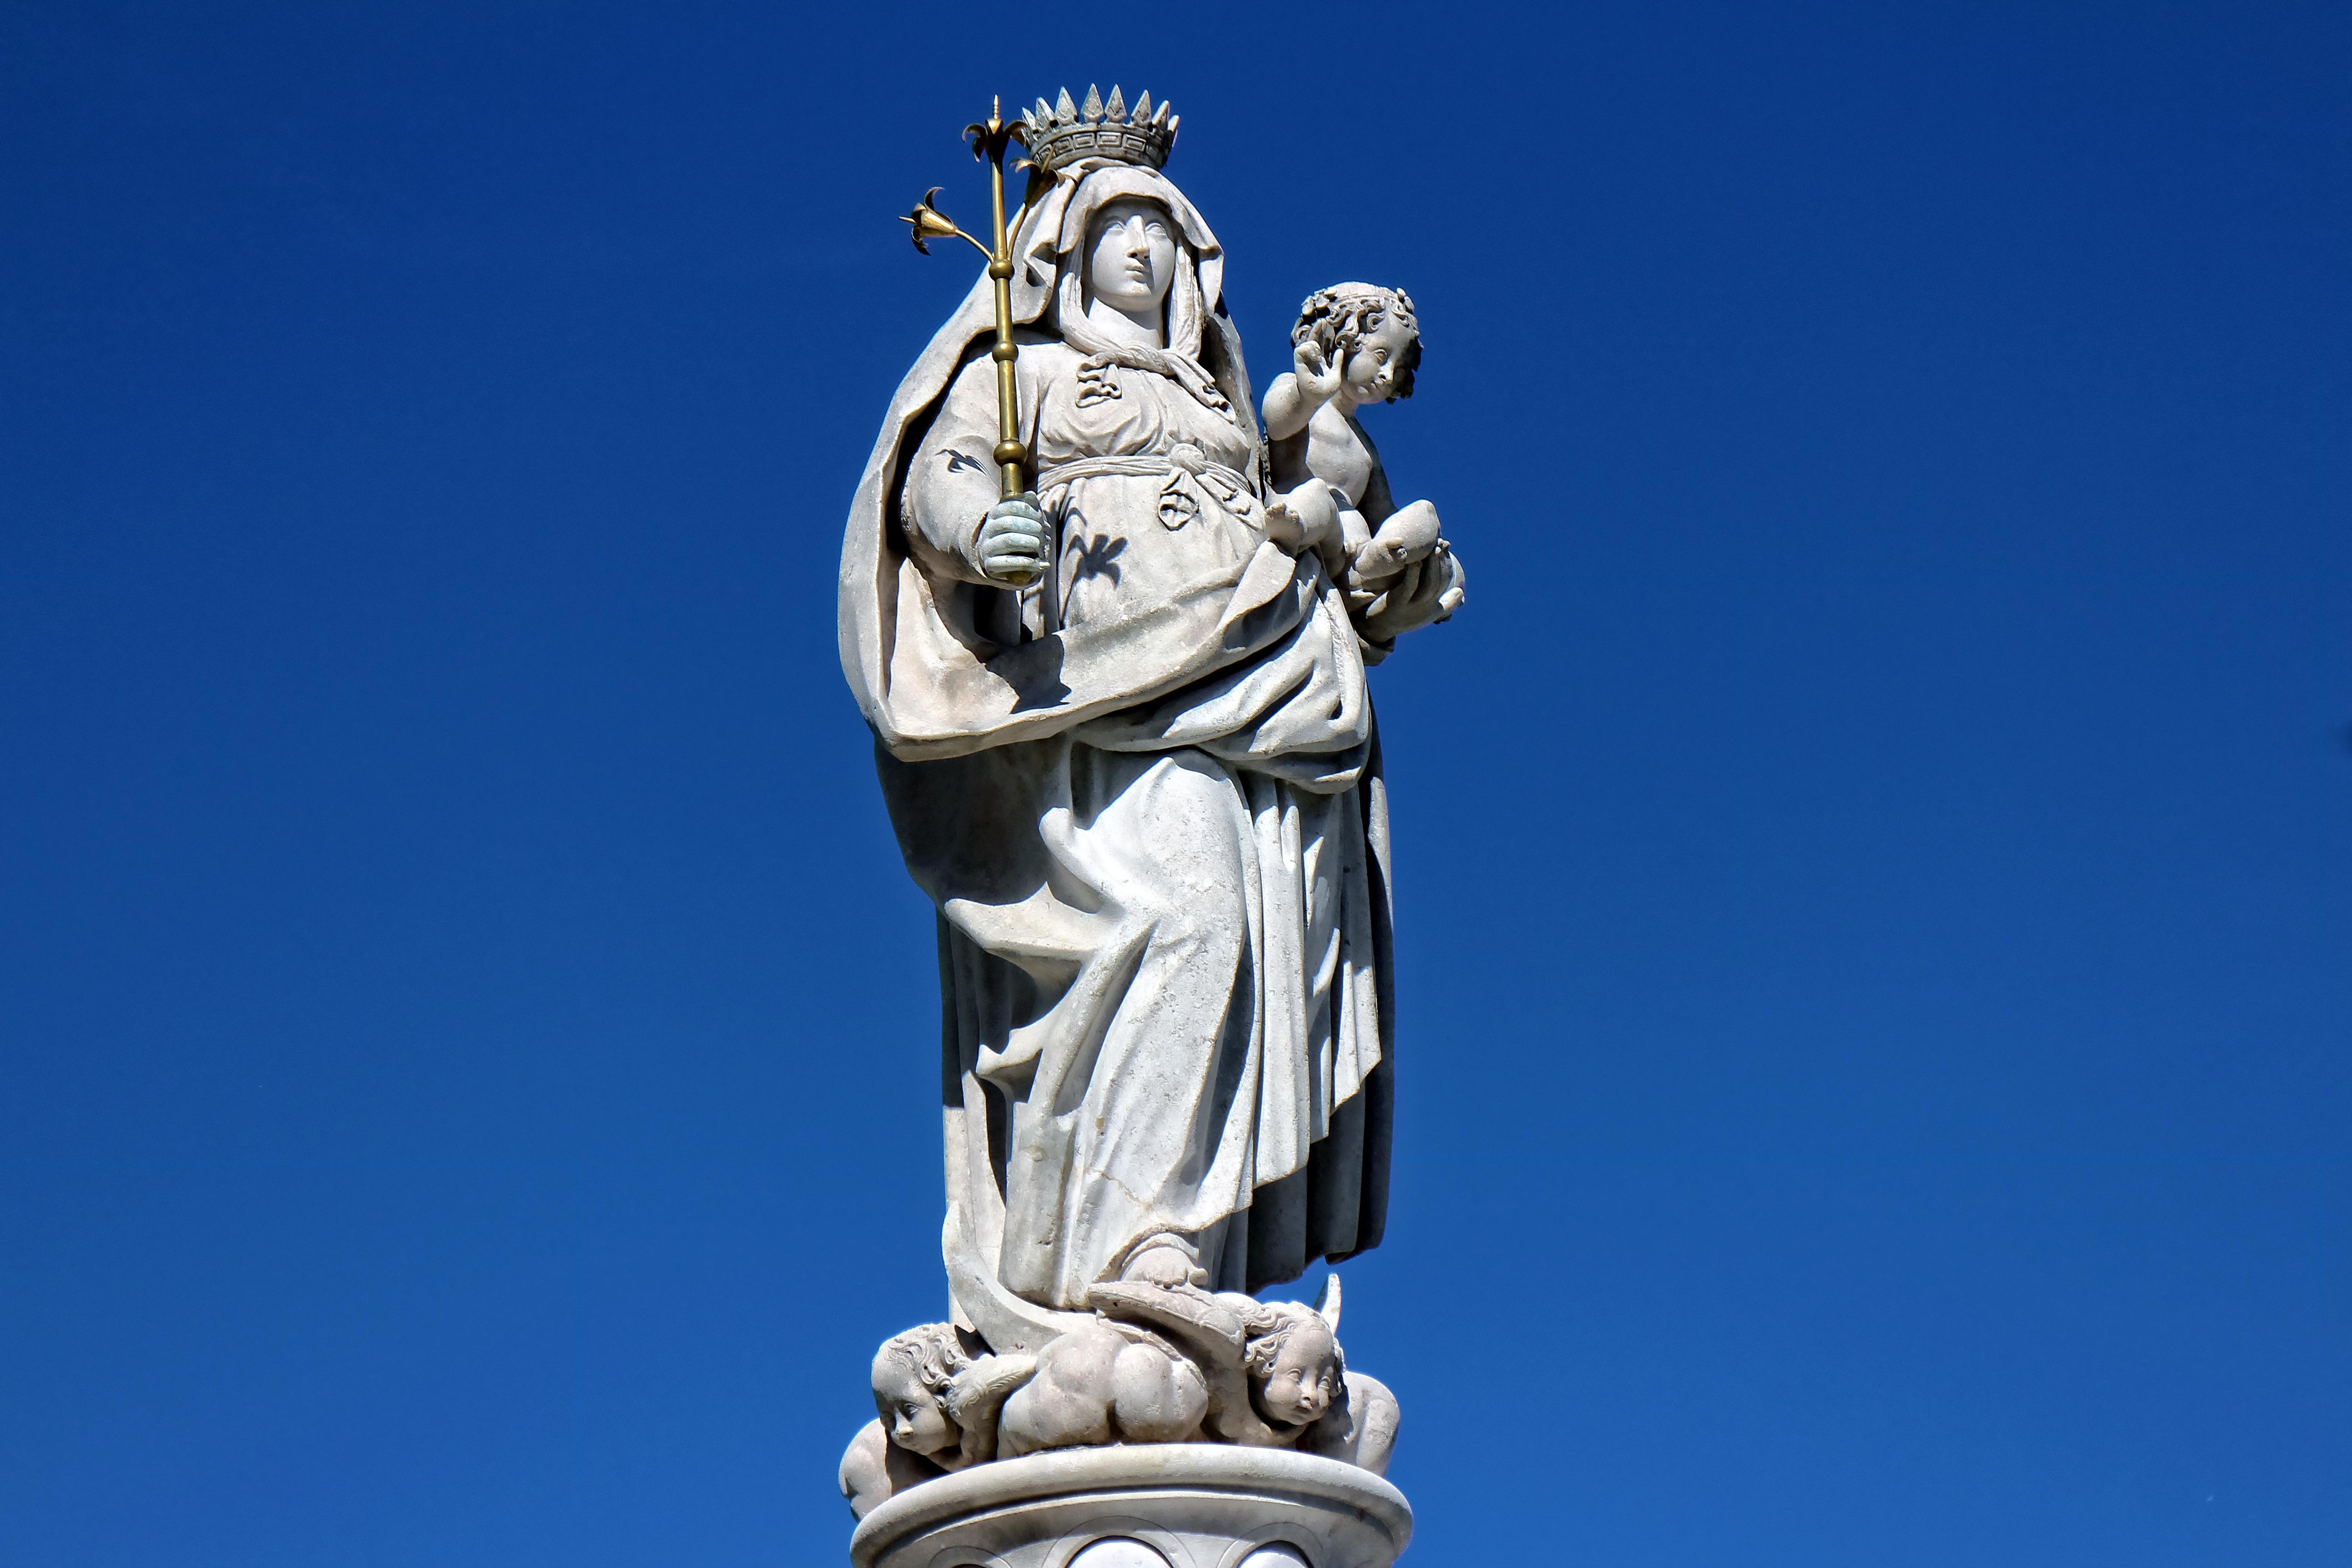 Photography Statue Monument Gothic Religion Sky Skies: Free Images : Sky, Monument, Statue, Religion, Blue